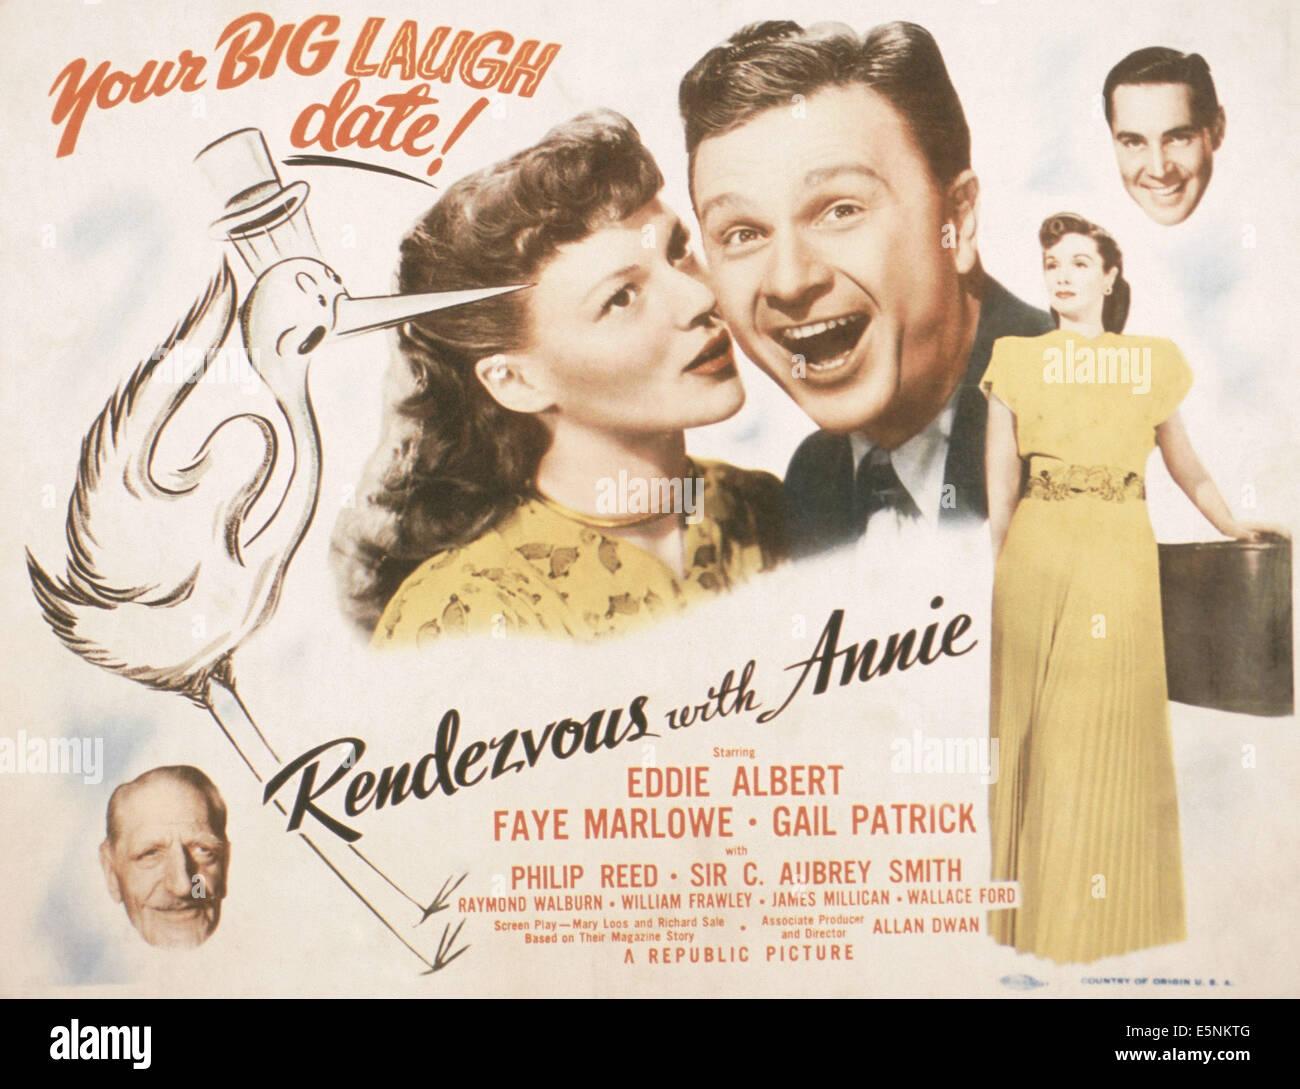 Risultati immagini per rendezvous with annie film 1946